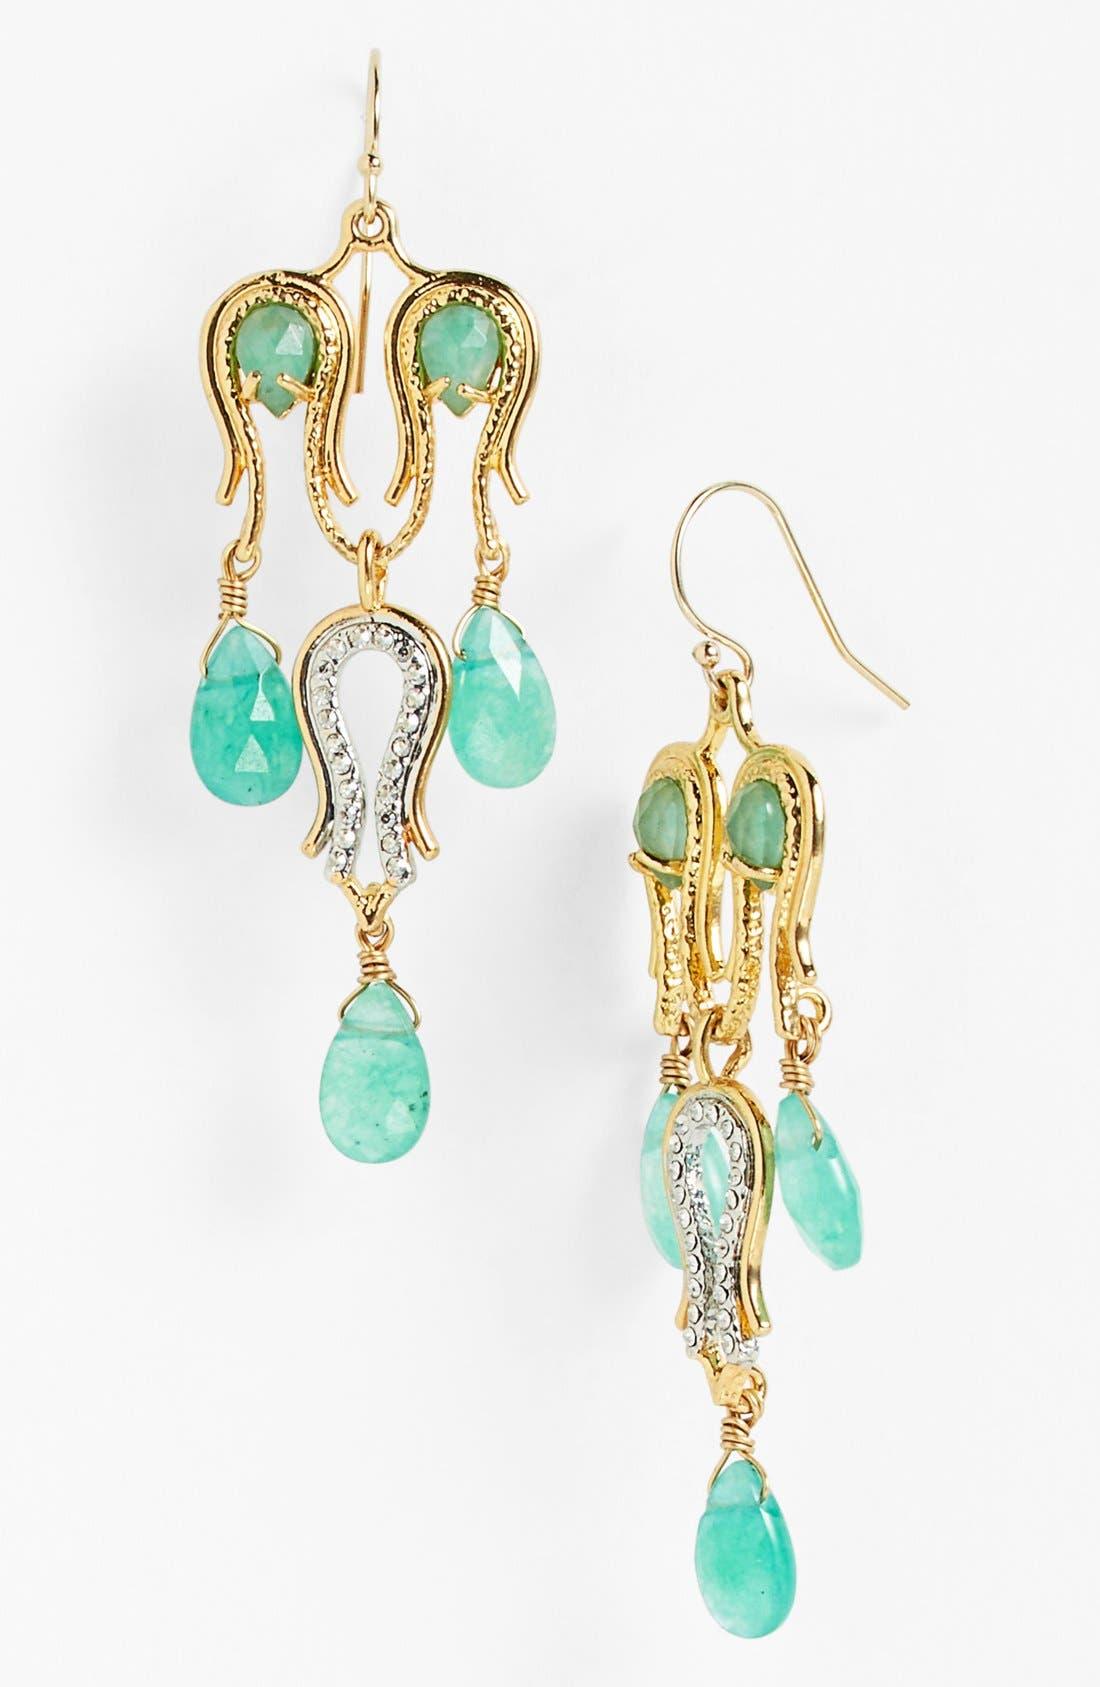 Alternate Image 1 Selected - Alexis Bittar 'Elements - Maldivian' Semiprecious Stone Chandelier Earrings